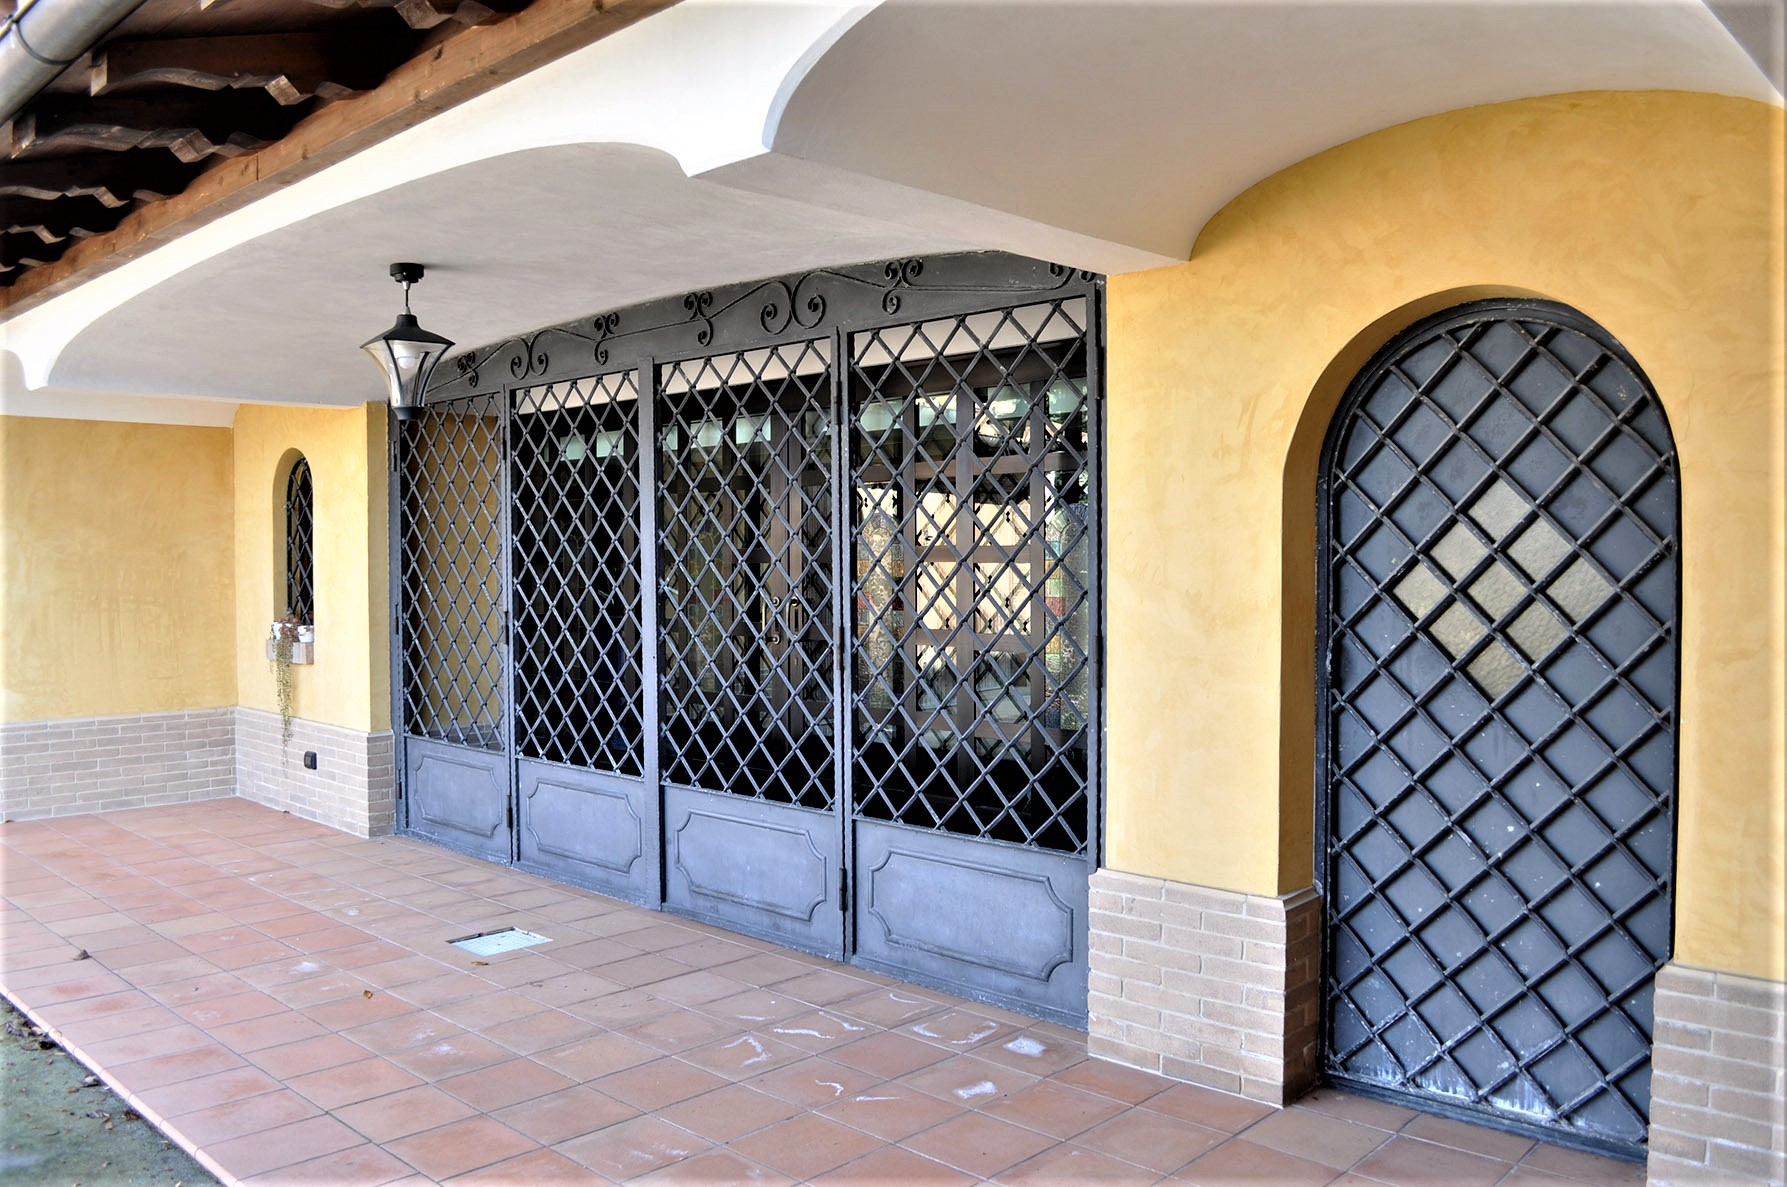 Villa Villa for sale Tortoreto (TE), Villa Bianca - Tortoreto - EUR 770.233 400